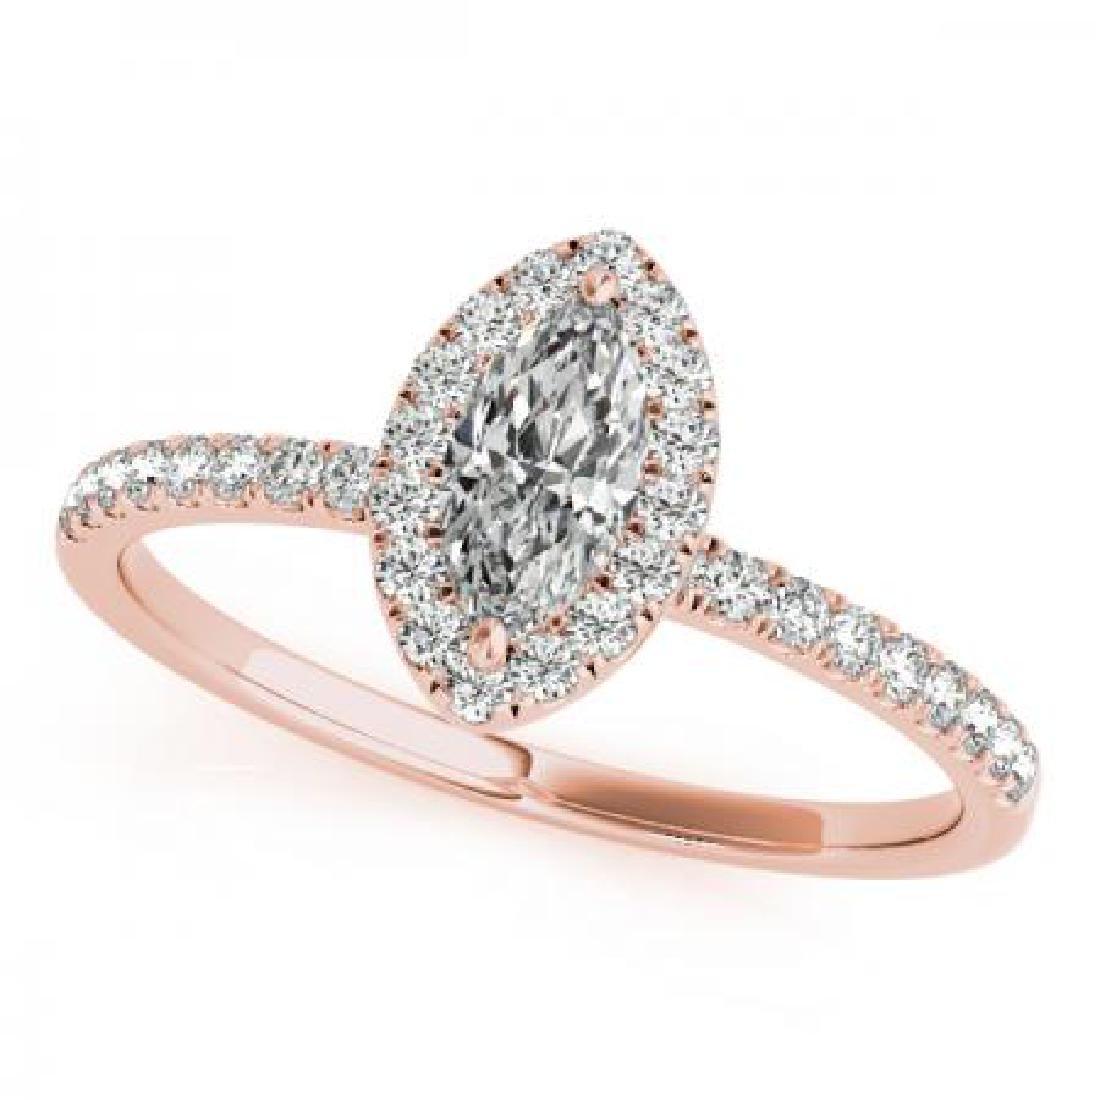 CERTIFIED 14KT ROSE GOLD 1.47 CT G-H/VS-SI1 DIAMOND HAL